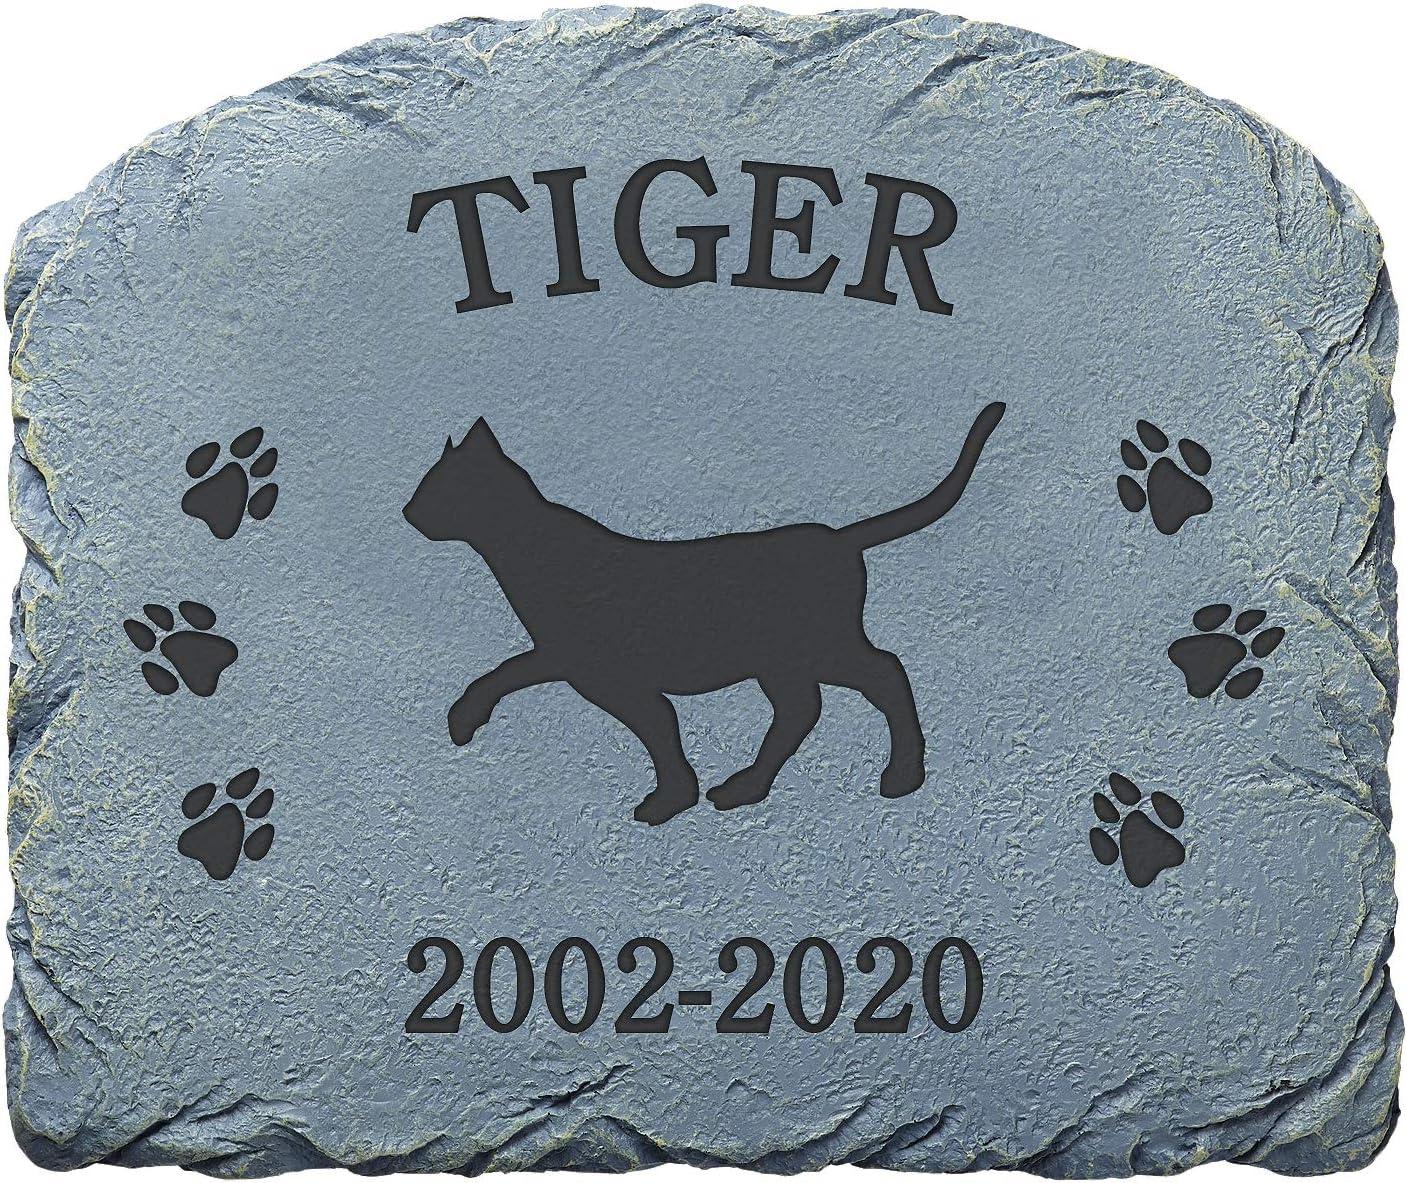 Let's Make Memories Personalized Choice Memorial - Garden Pet Stone OFFicial store Mem